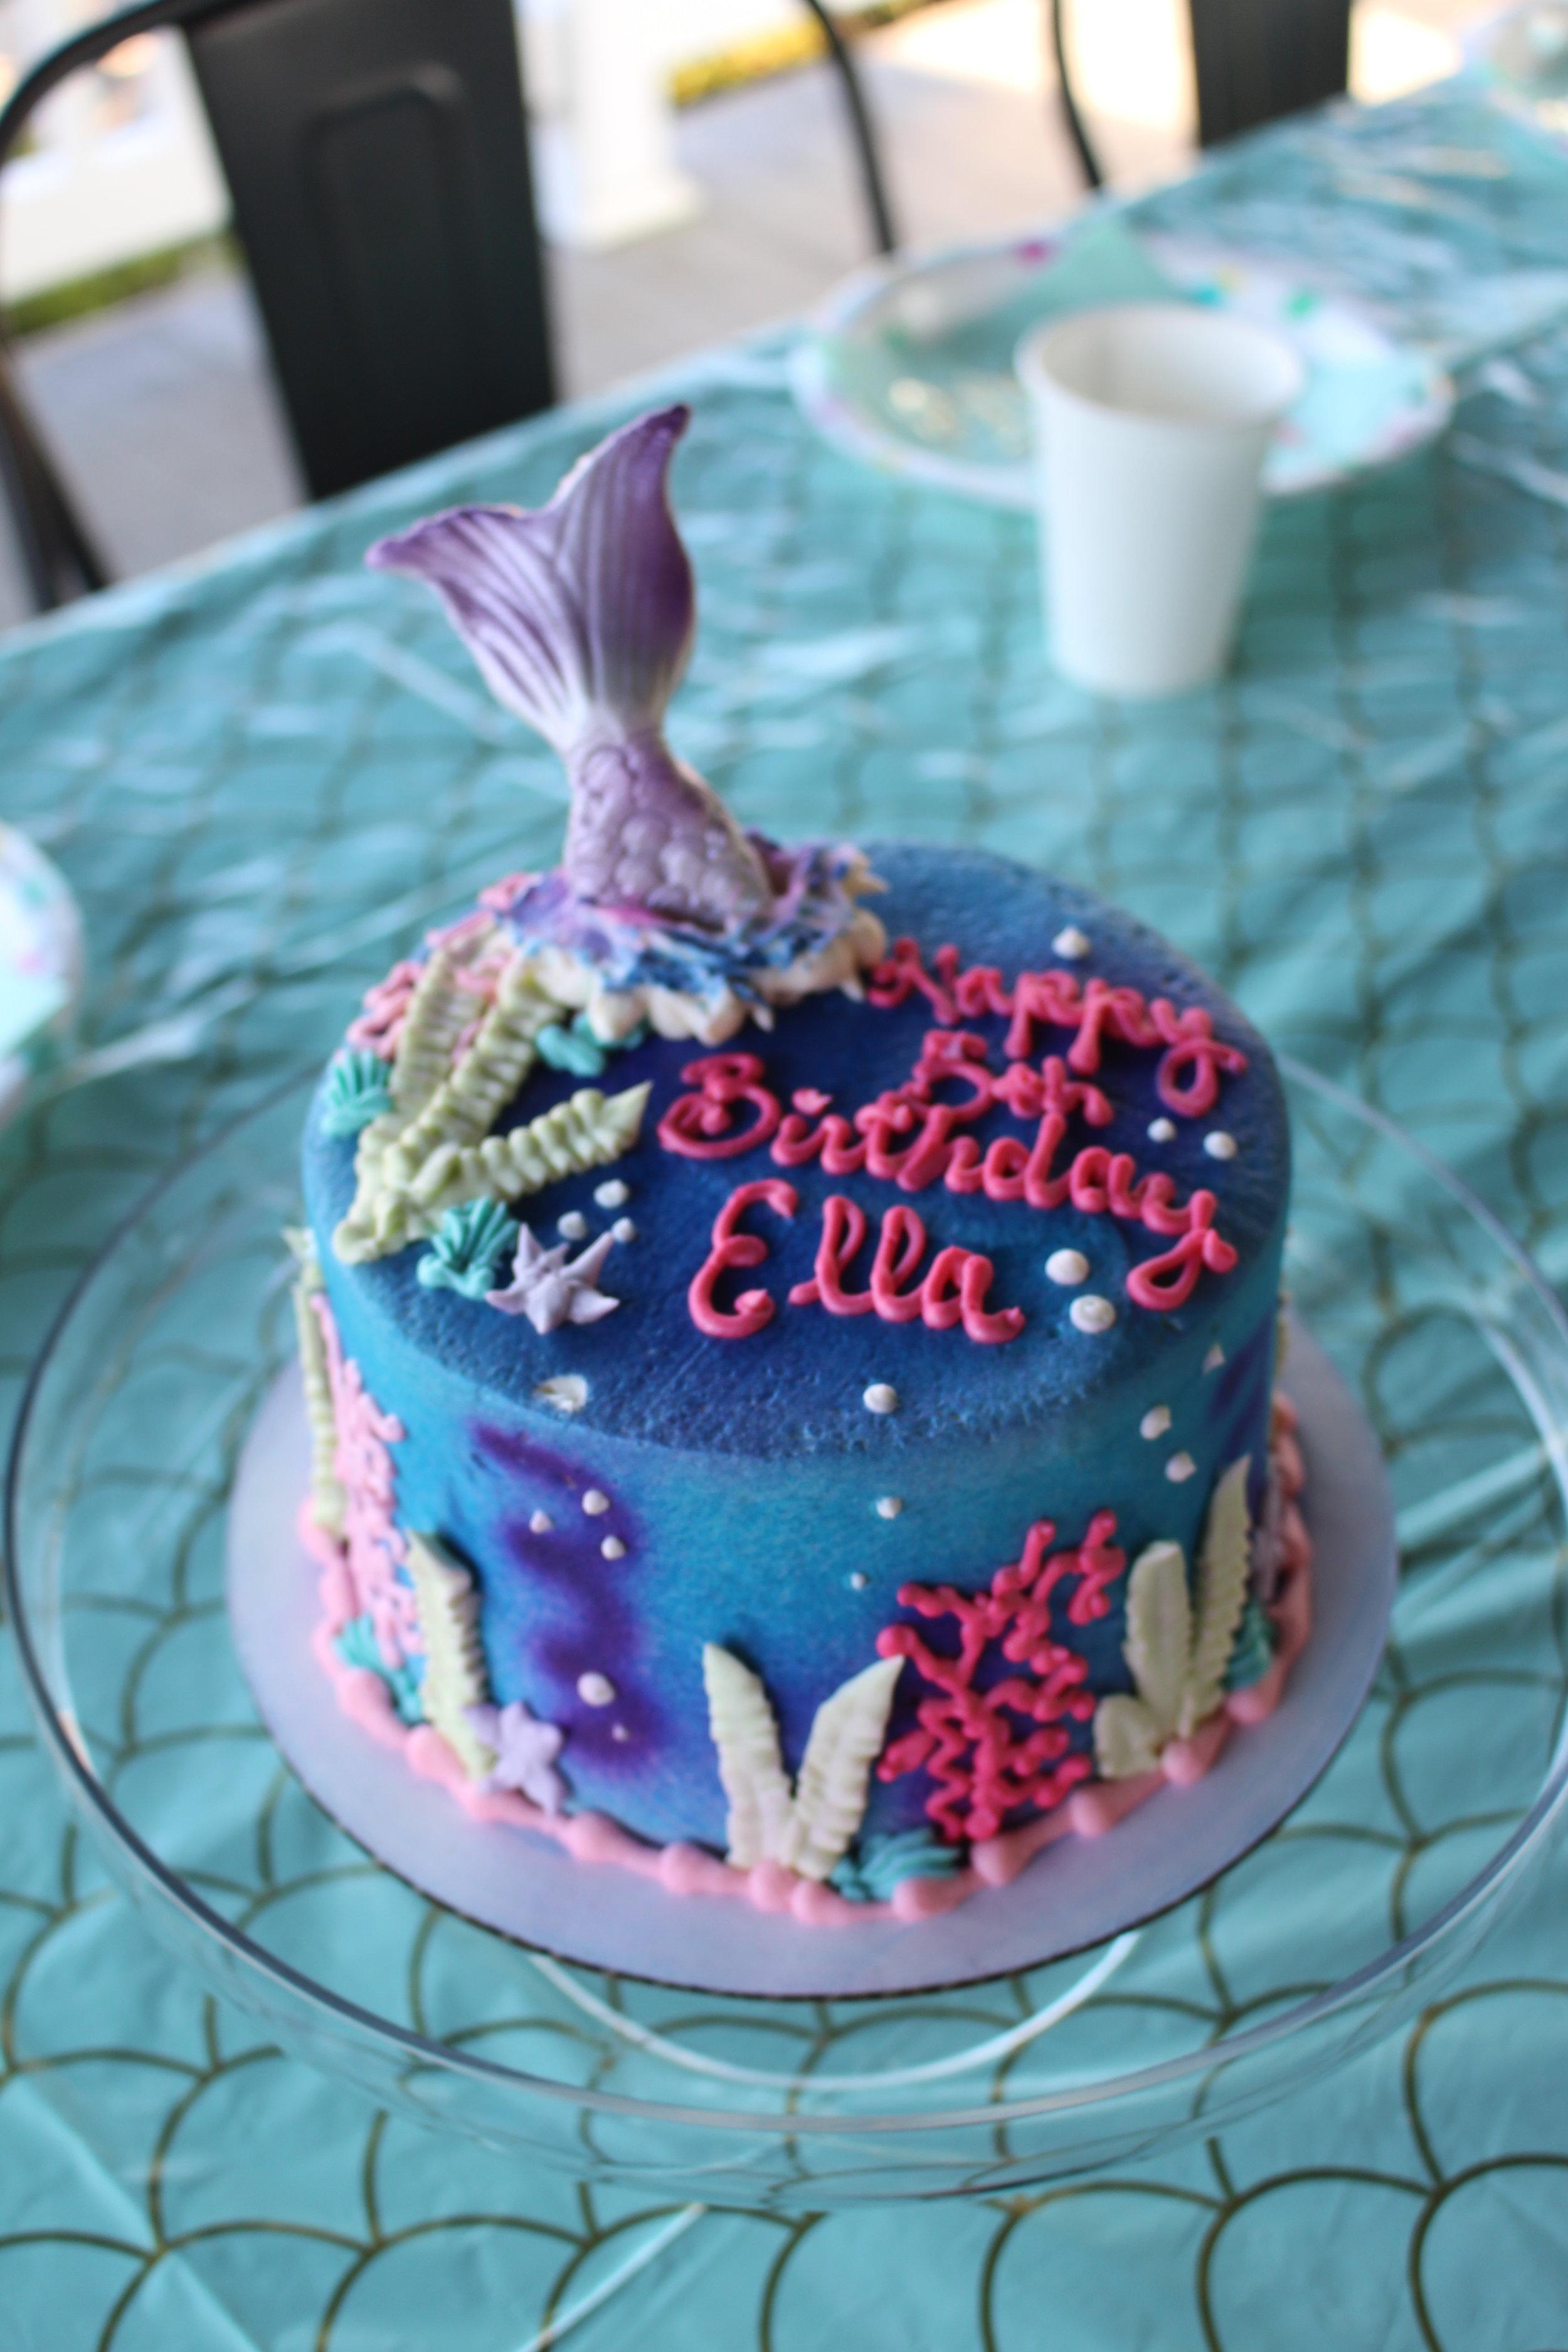 ella cake.JPG